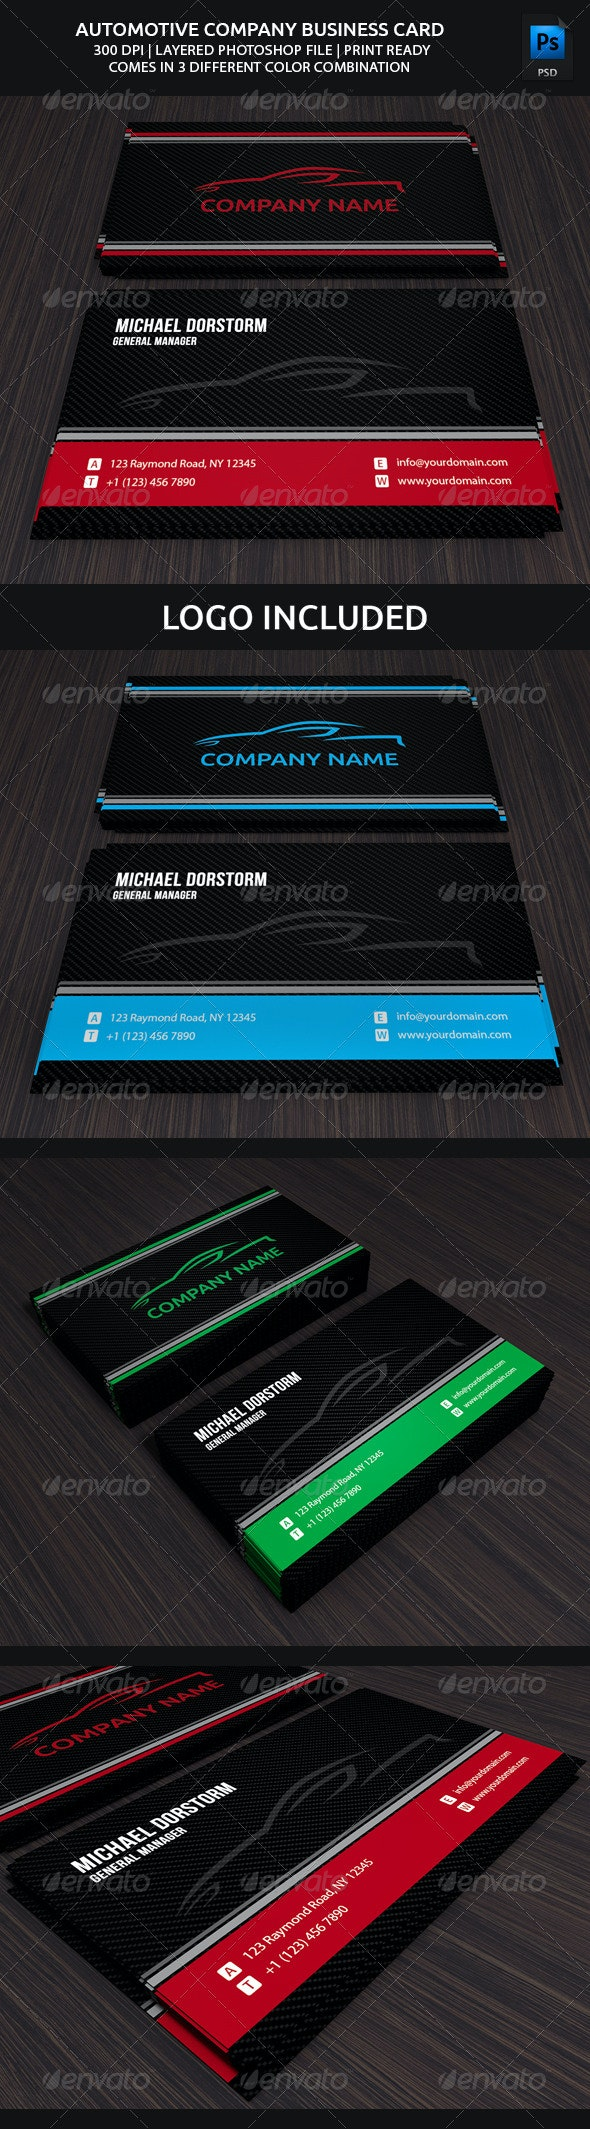 Carbon Automotive Business Card - Corporate Business Cards